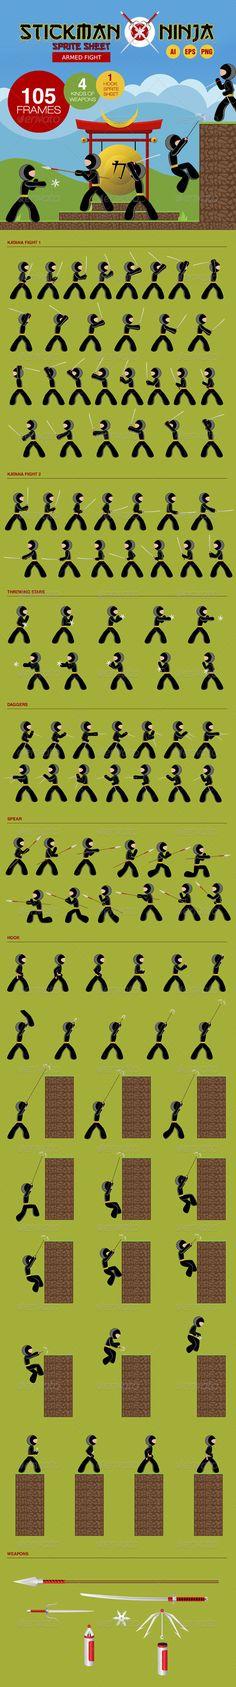 Stickman Ninja Sprite Sheet - Armed Fight - Sprites Game Assets